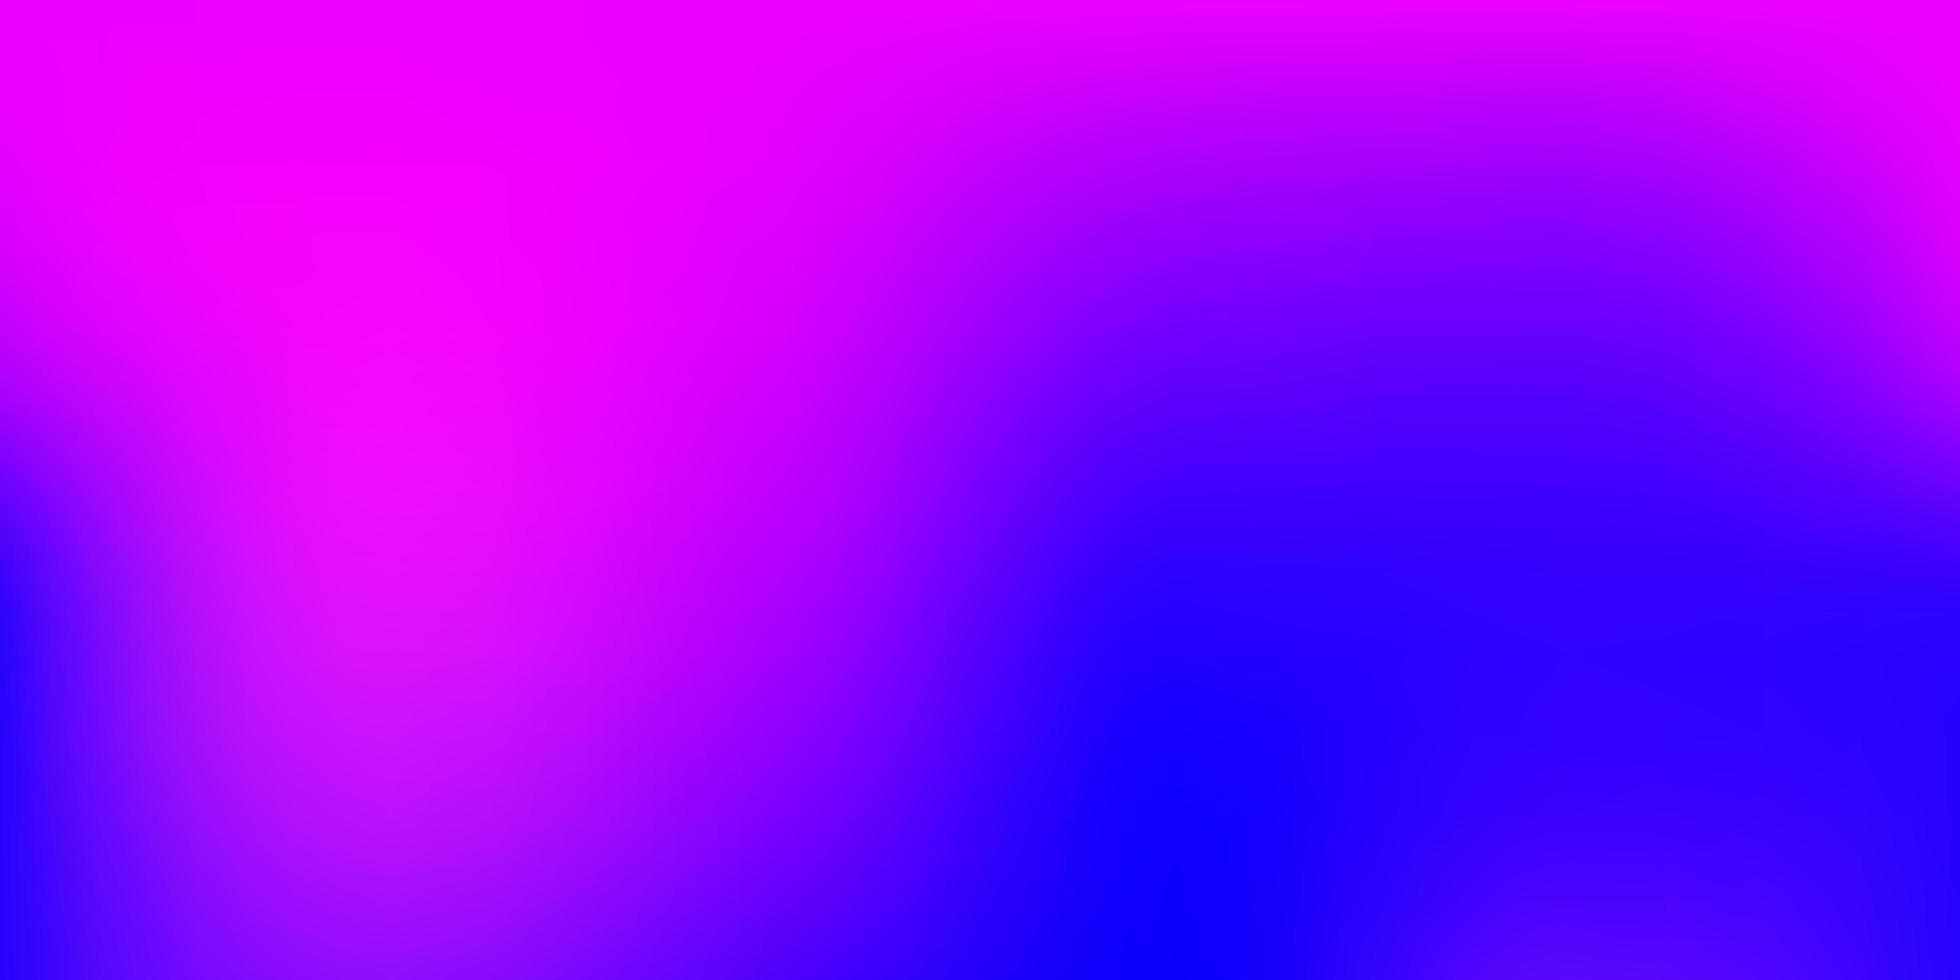 sfondo sfocato sfumato vettoriale rosa chiaro, blu.